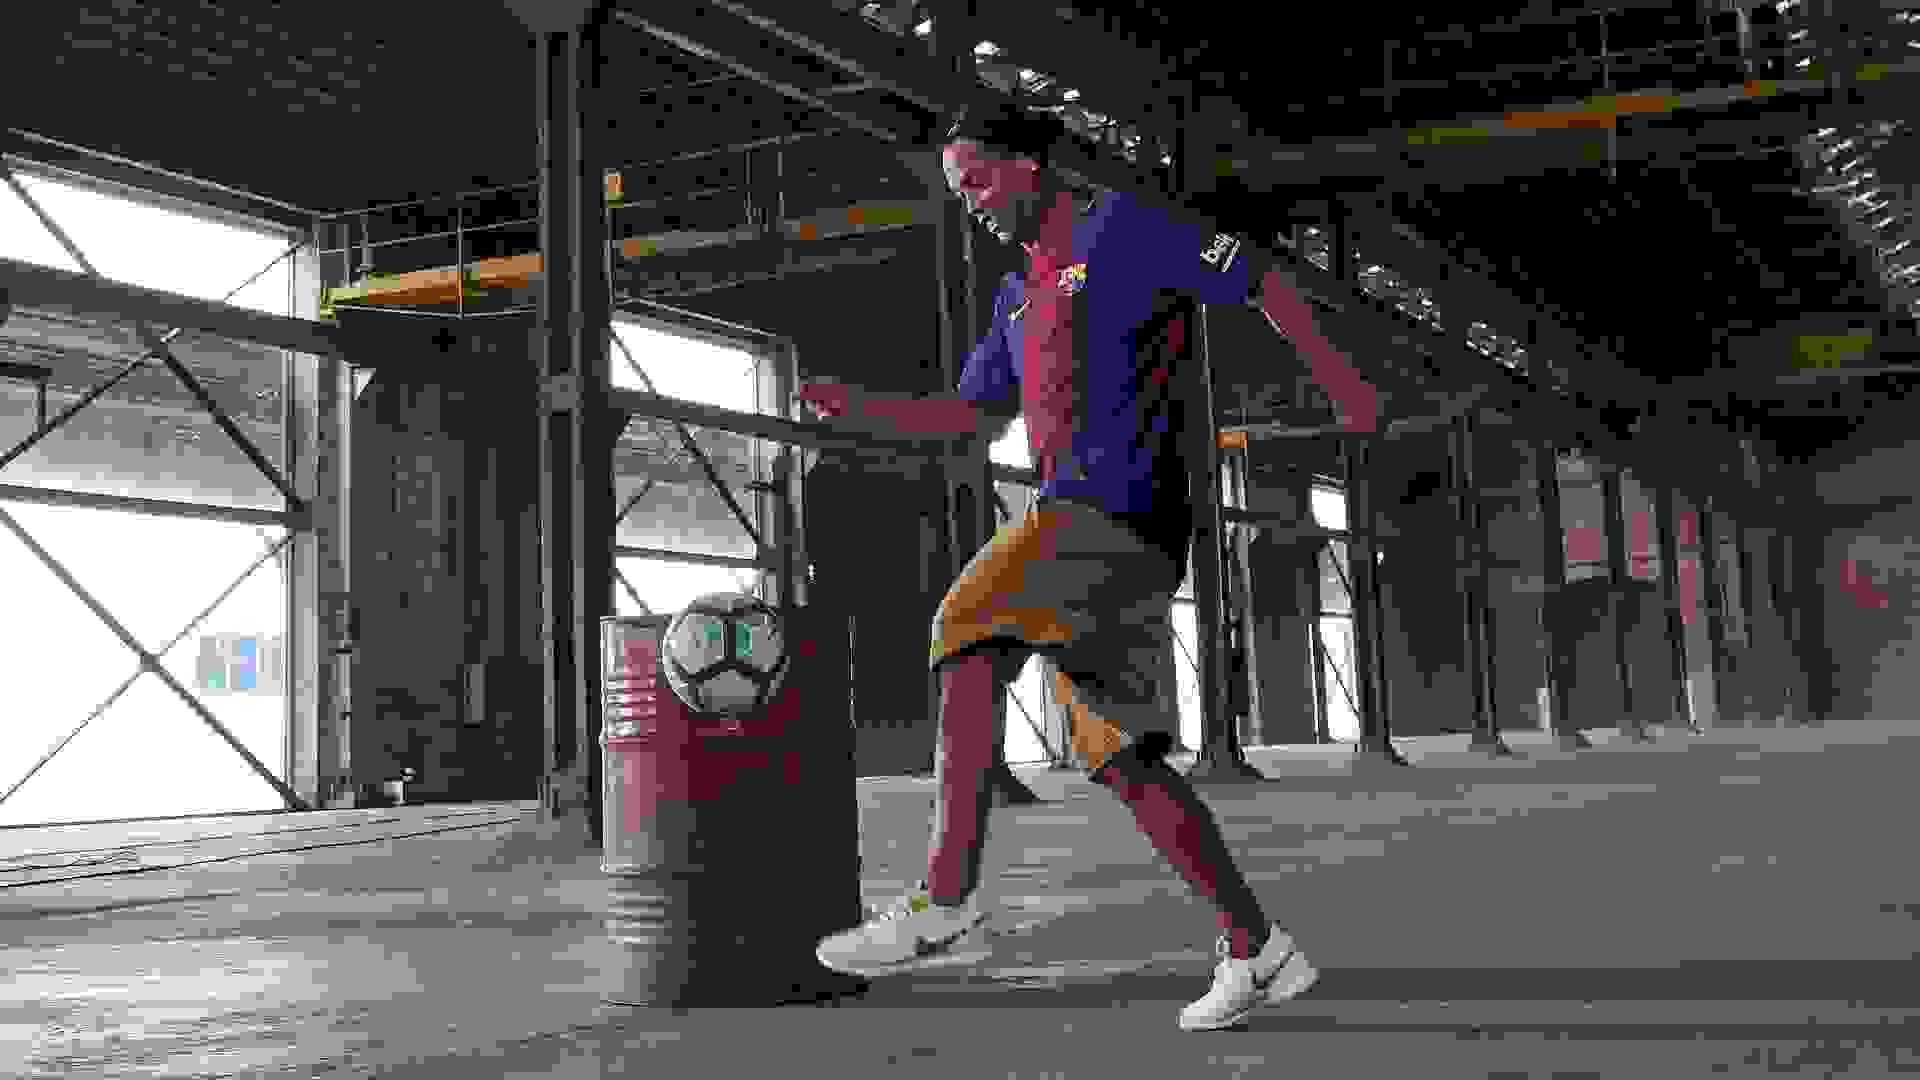 Ronaldinho spielt Indoor Fussball im Barcelona Trikot